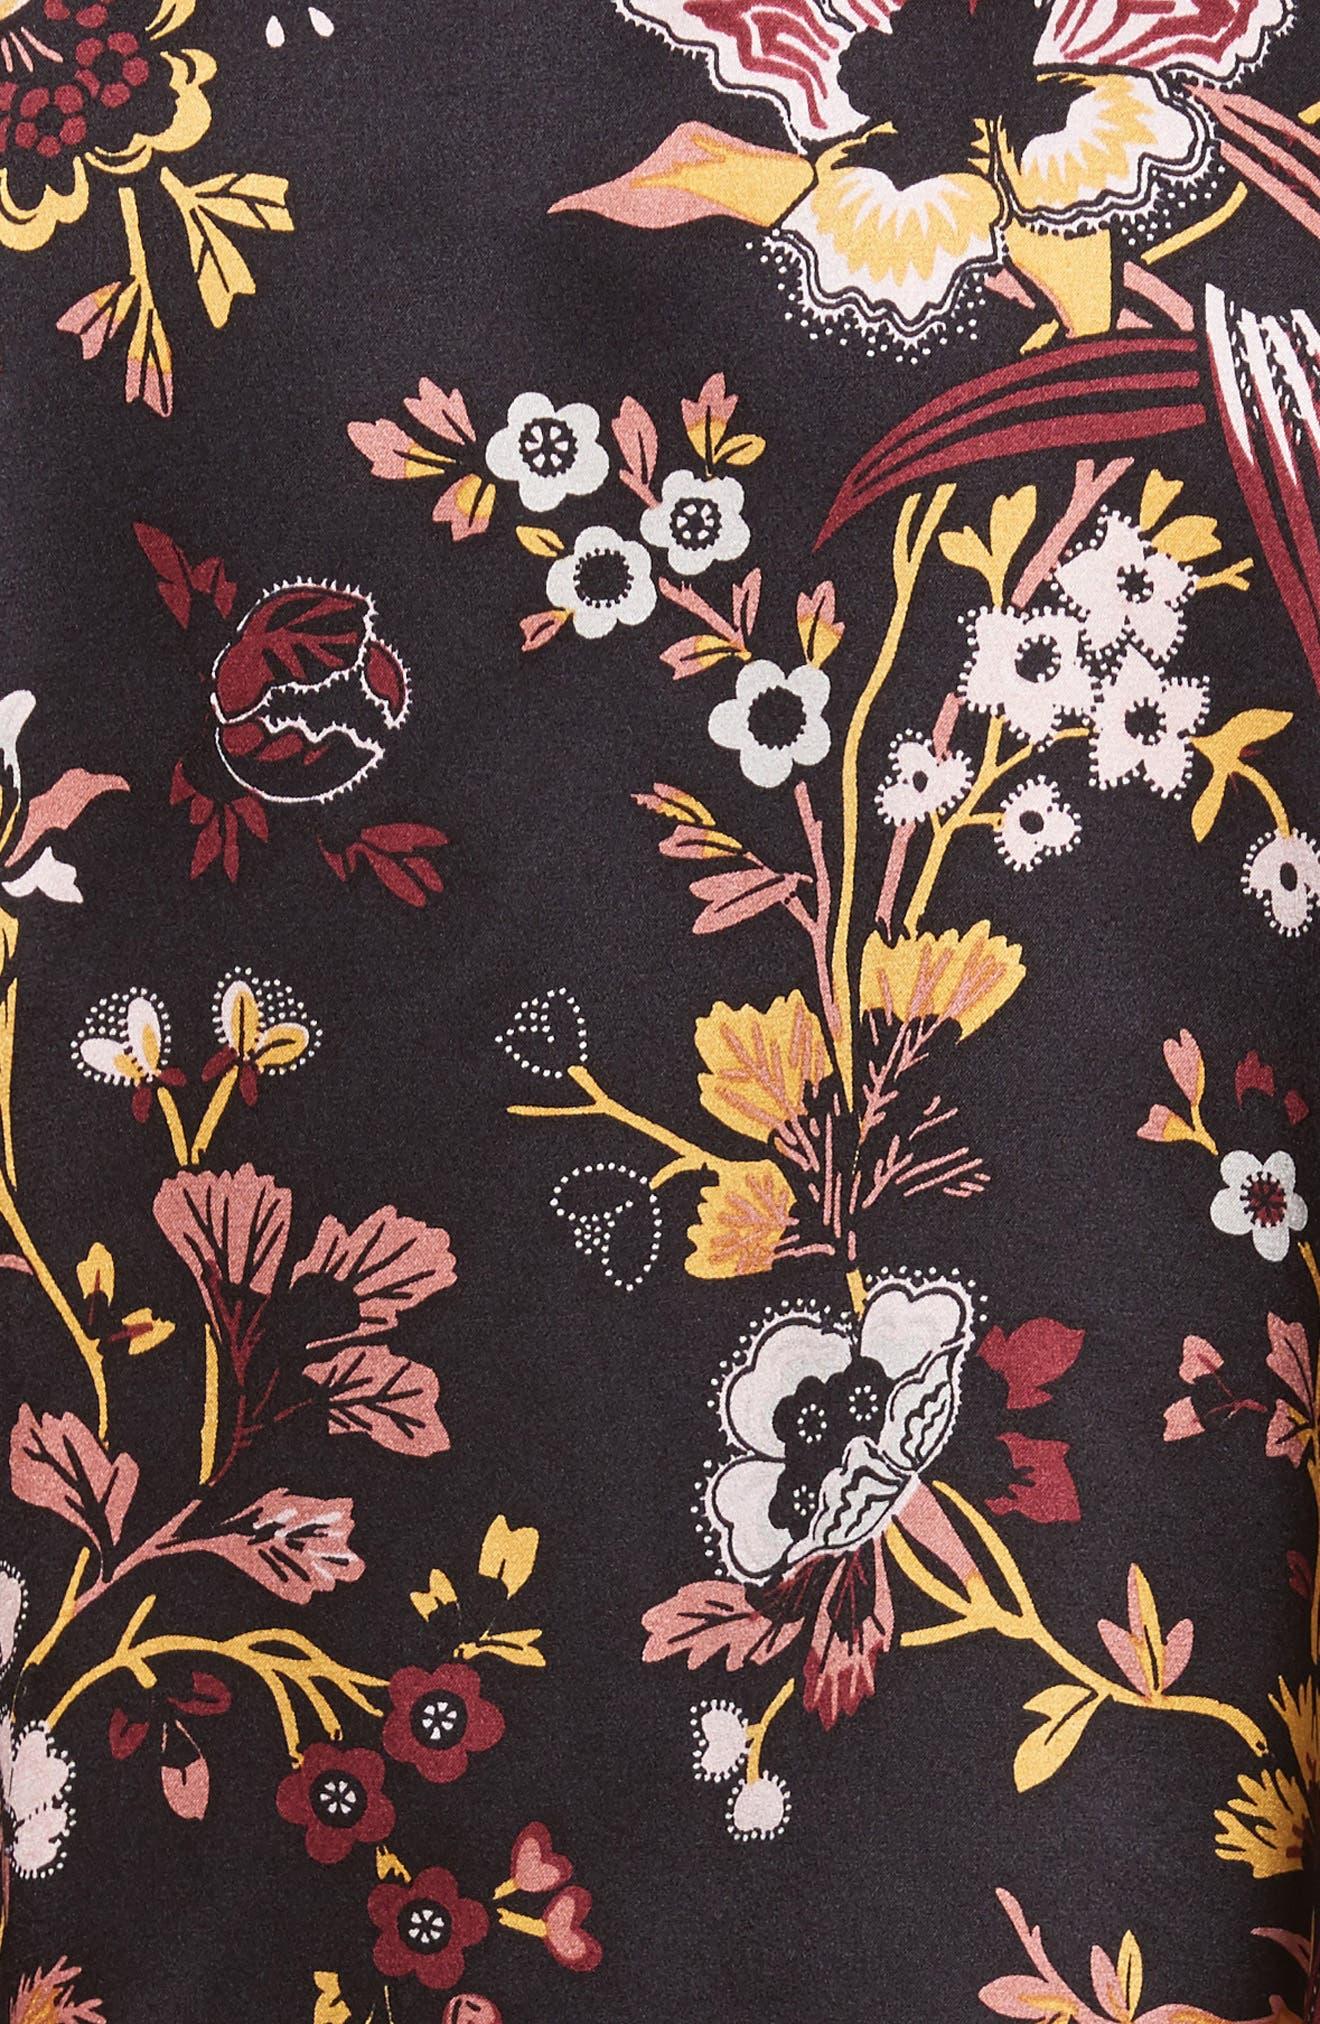 Verbena Floral Print Stretch Silk Dress,                             Alternate thumbnail 5, color,                             002